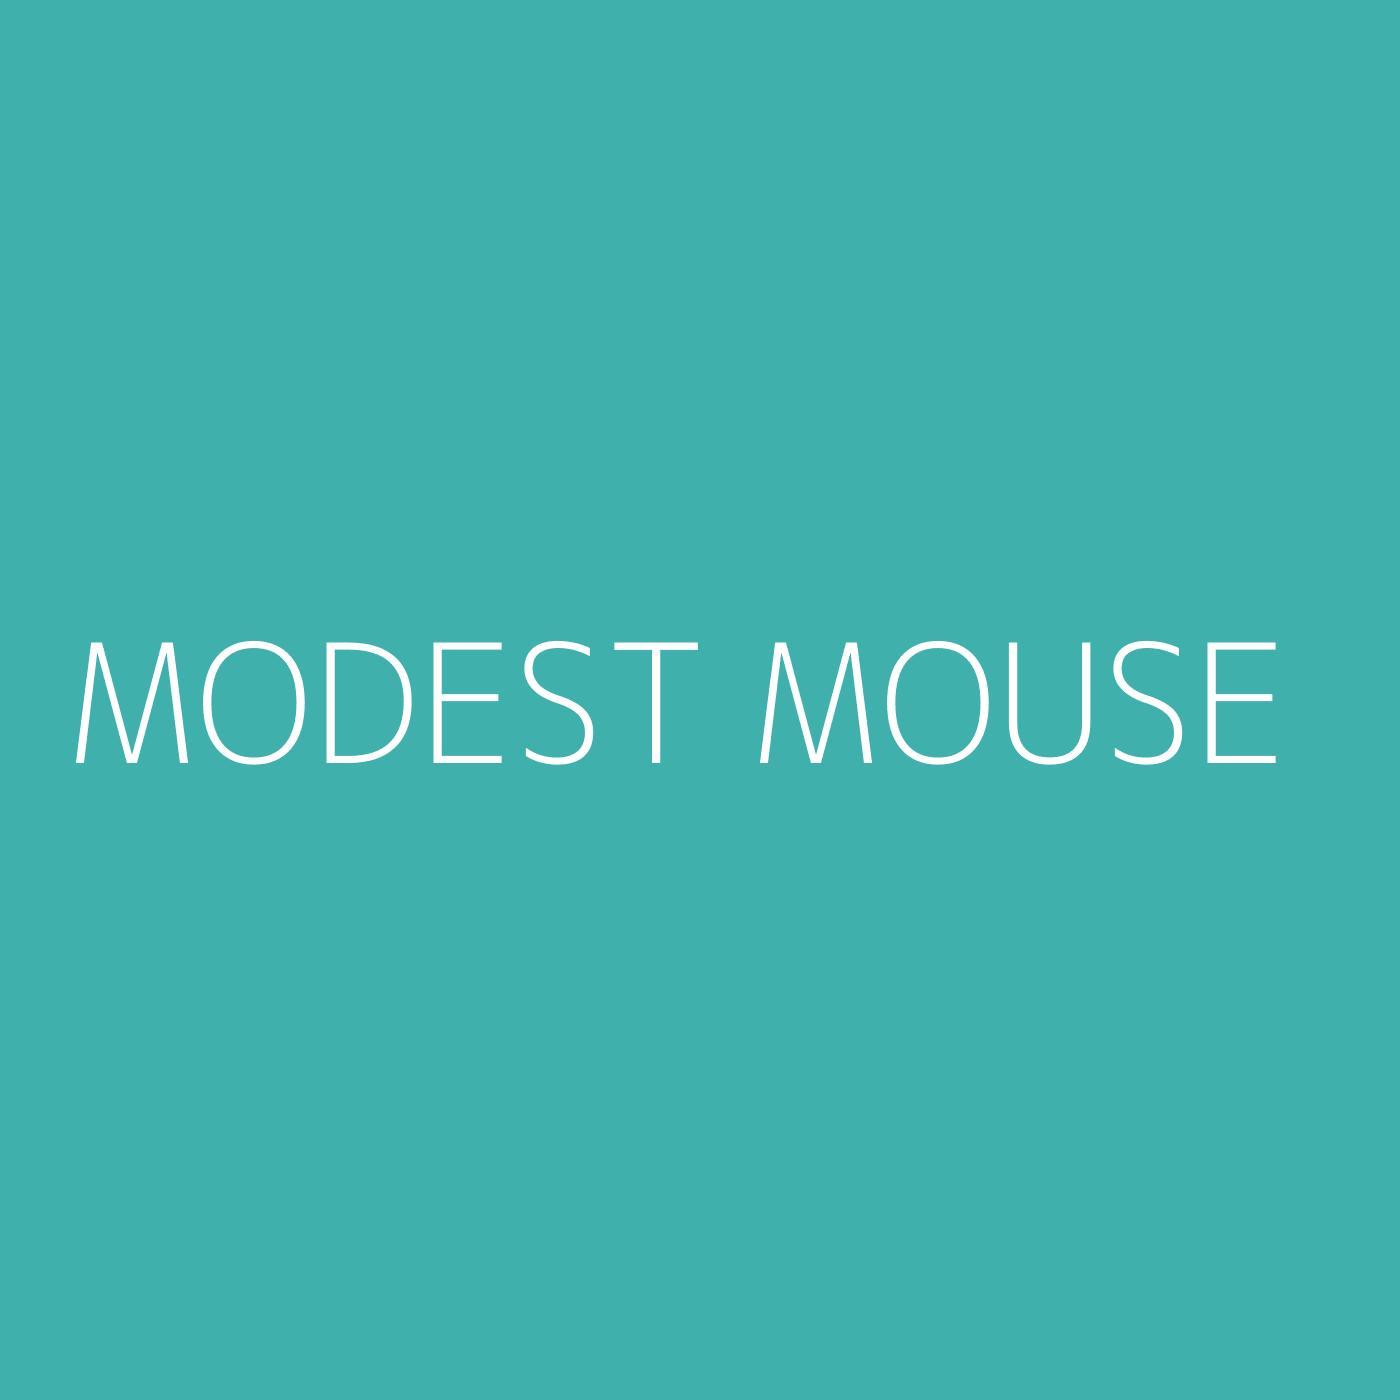 Modest Mouse Playlist Artwork